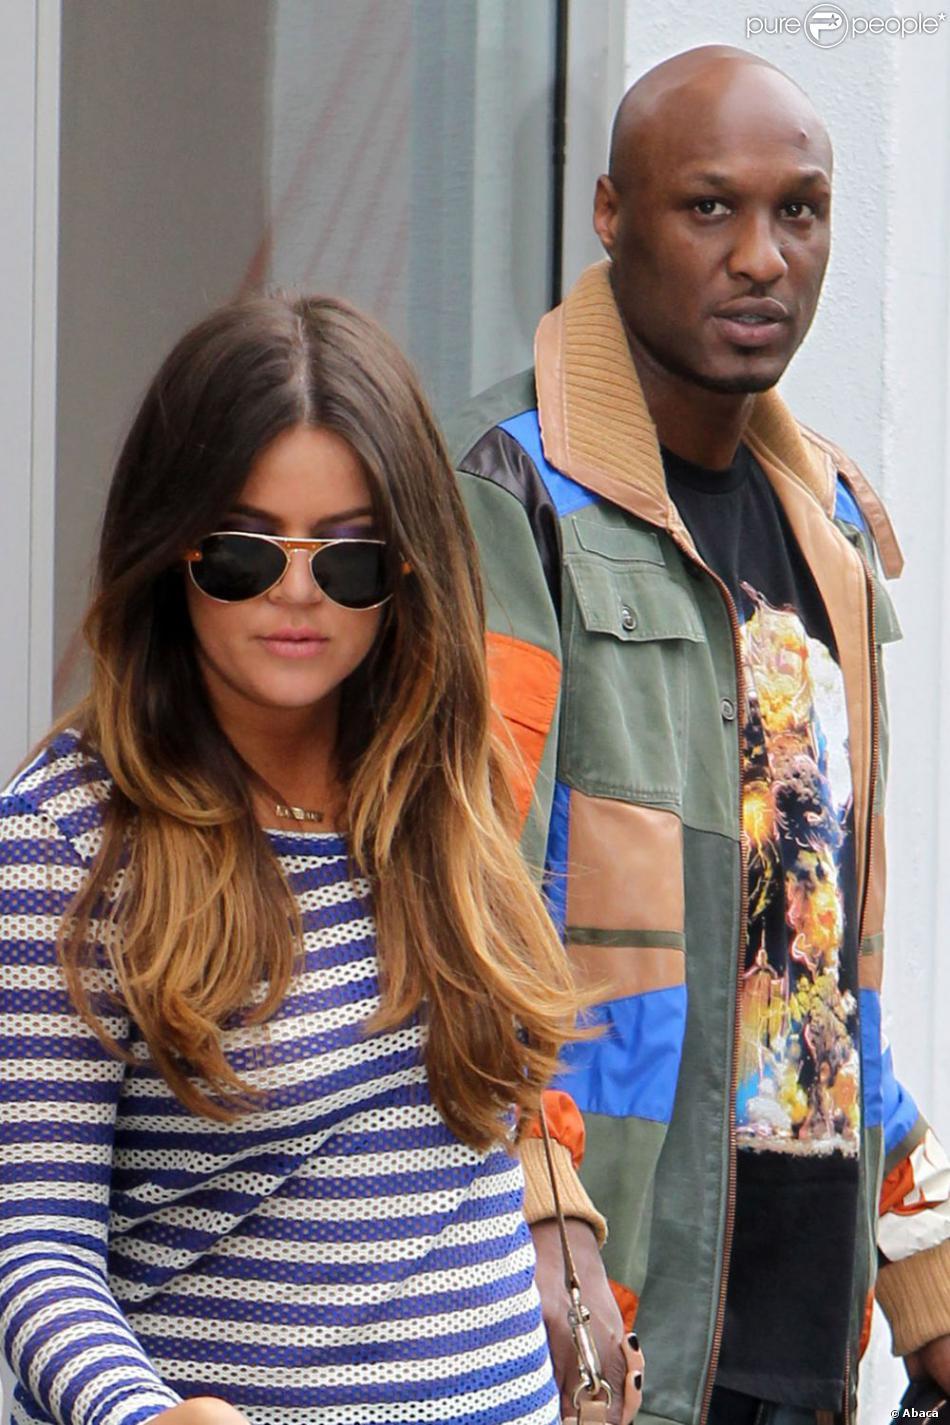 Khloé Kardashian et Lamar Odom à New York. Avril 2012.